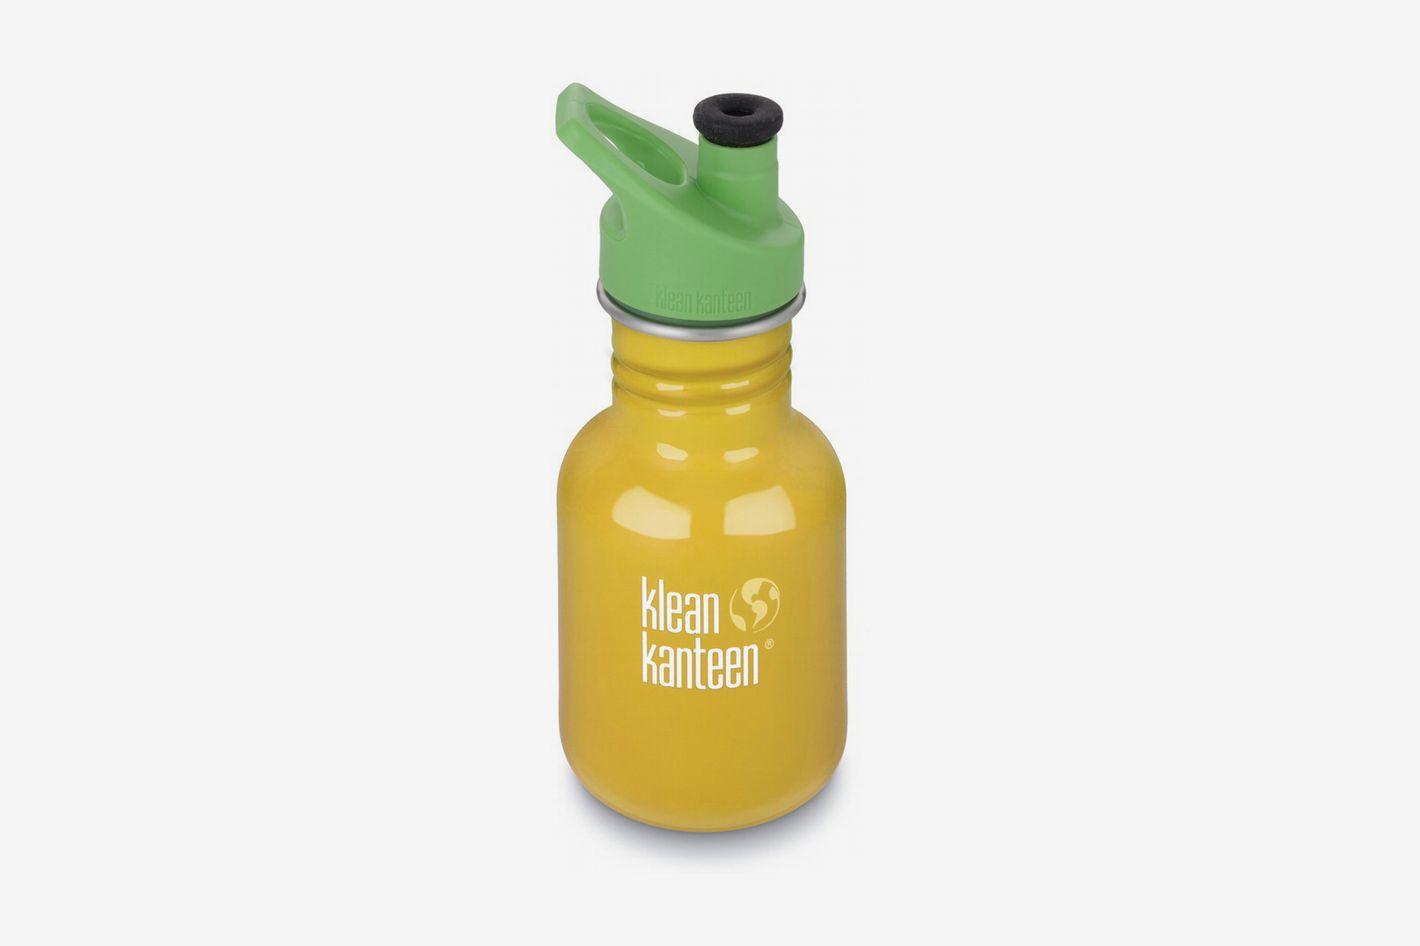 Klean Kanteen 12 oz Kid Kanteen Stainless Steel Sport Bottle